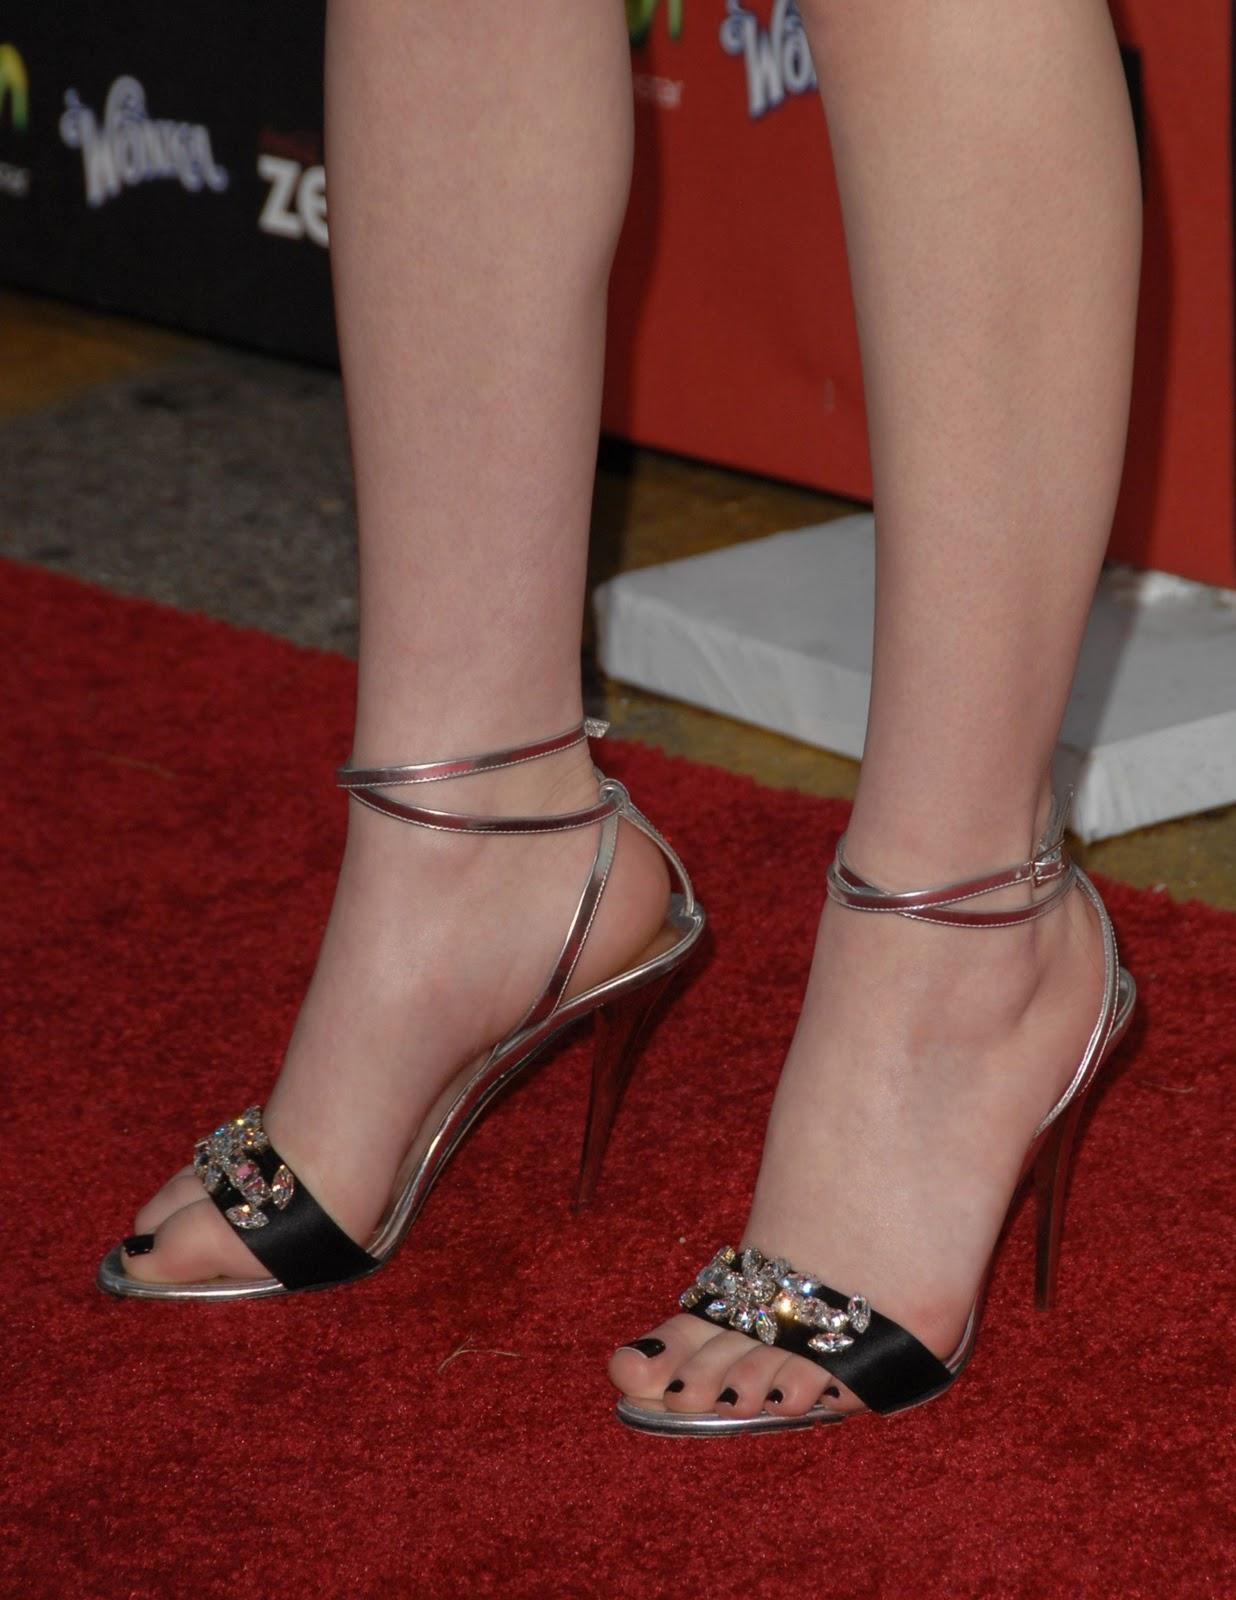 iCarly Feet - Bing images